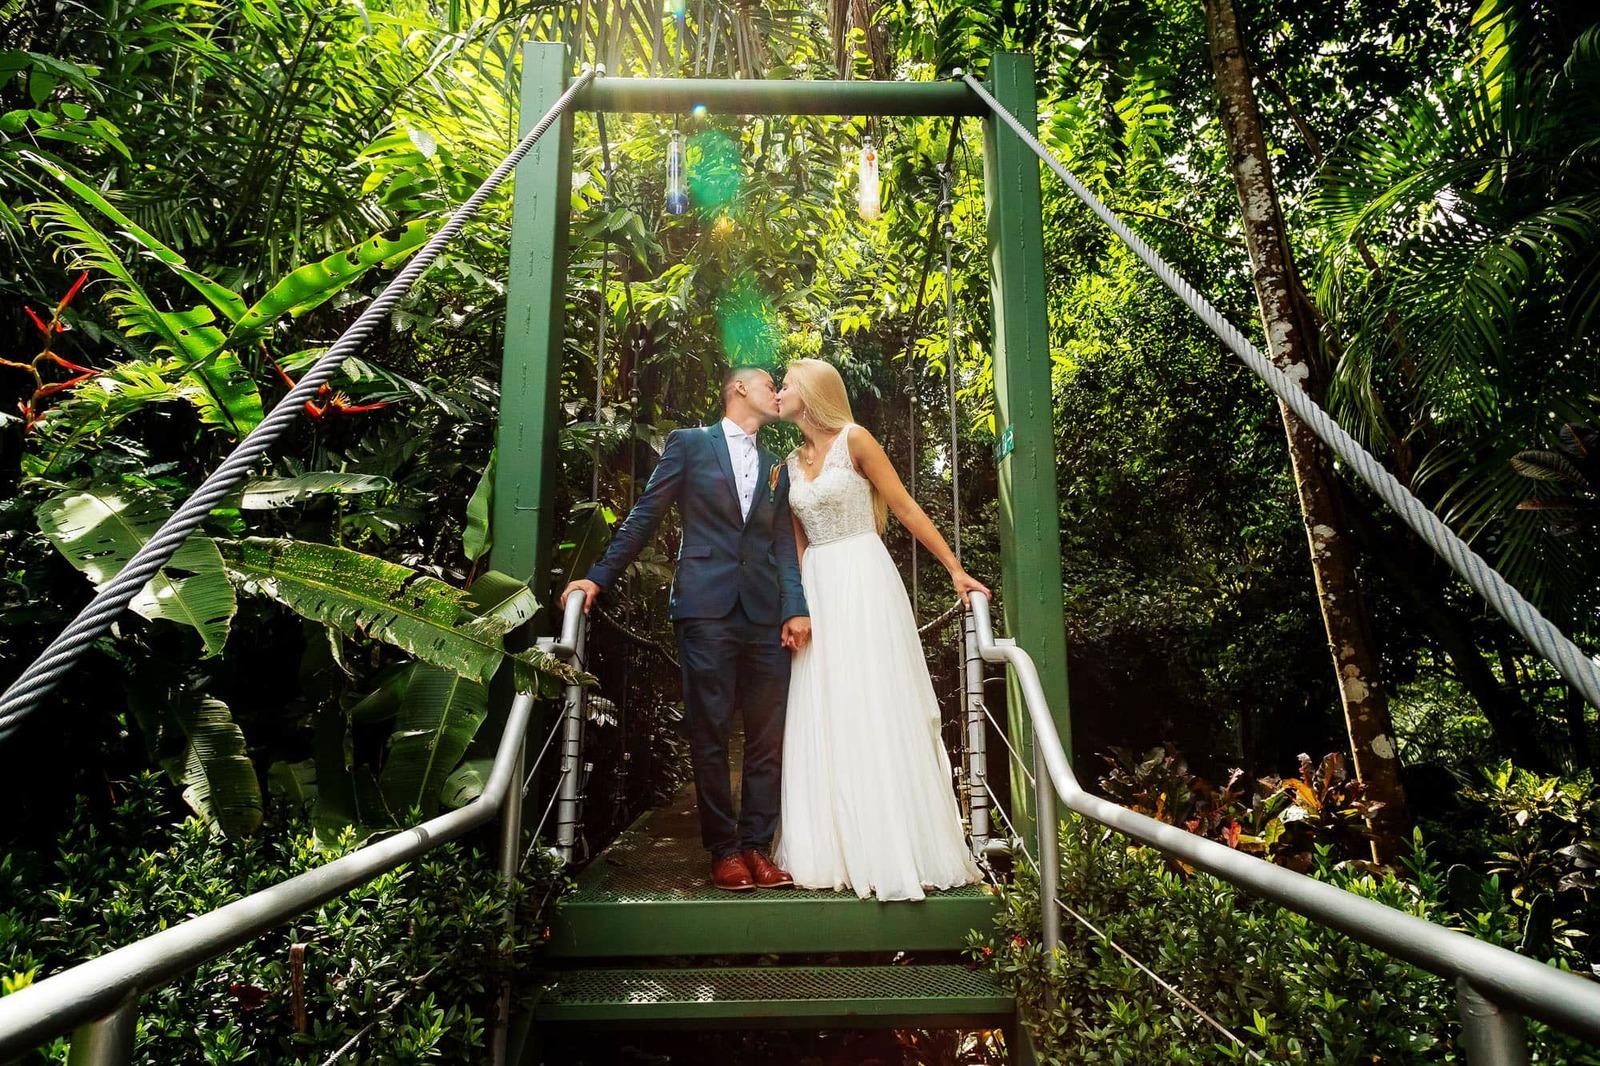 bride and groom on suspension bridge